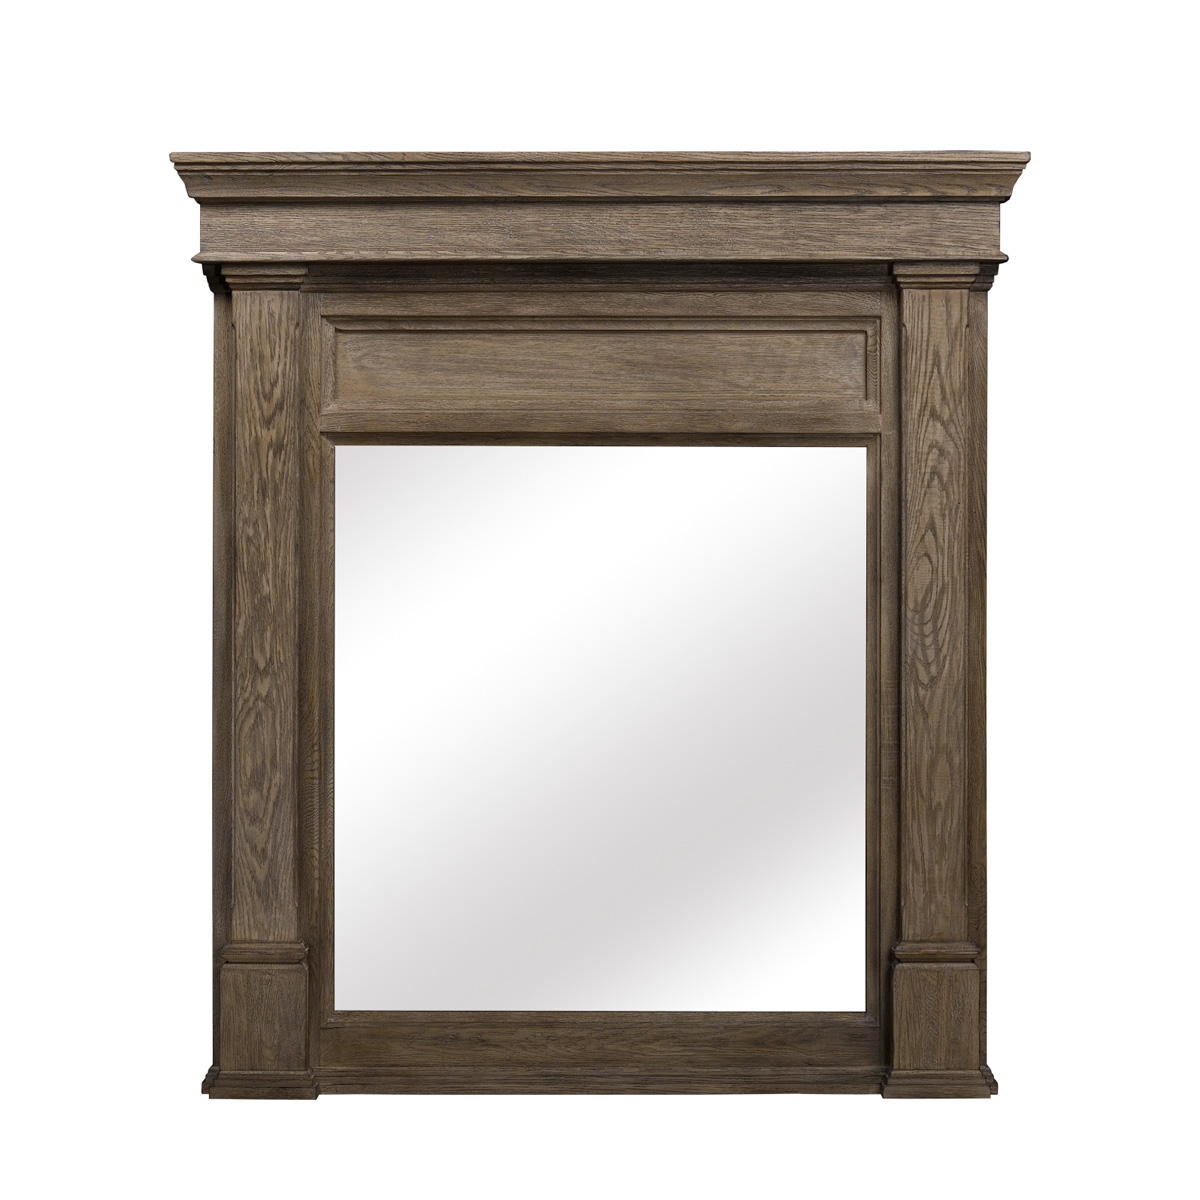 Эксклюзивное зеркало SUMNER MIRROR-0